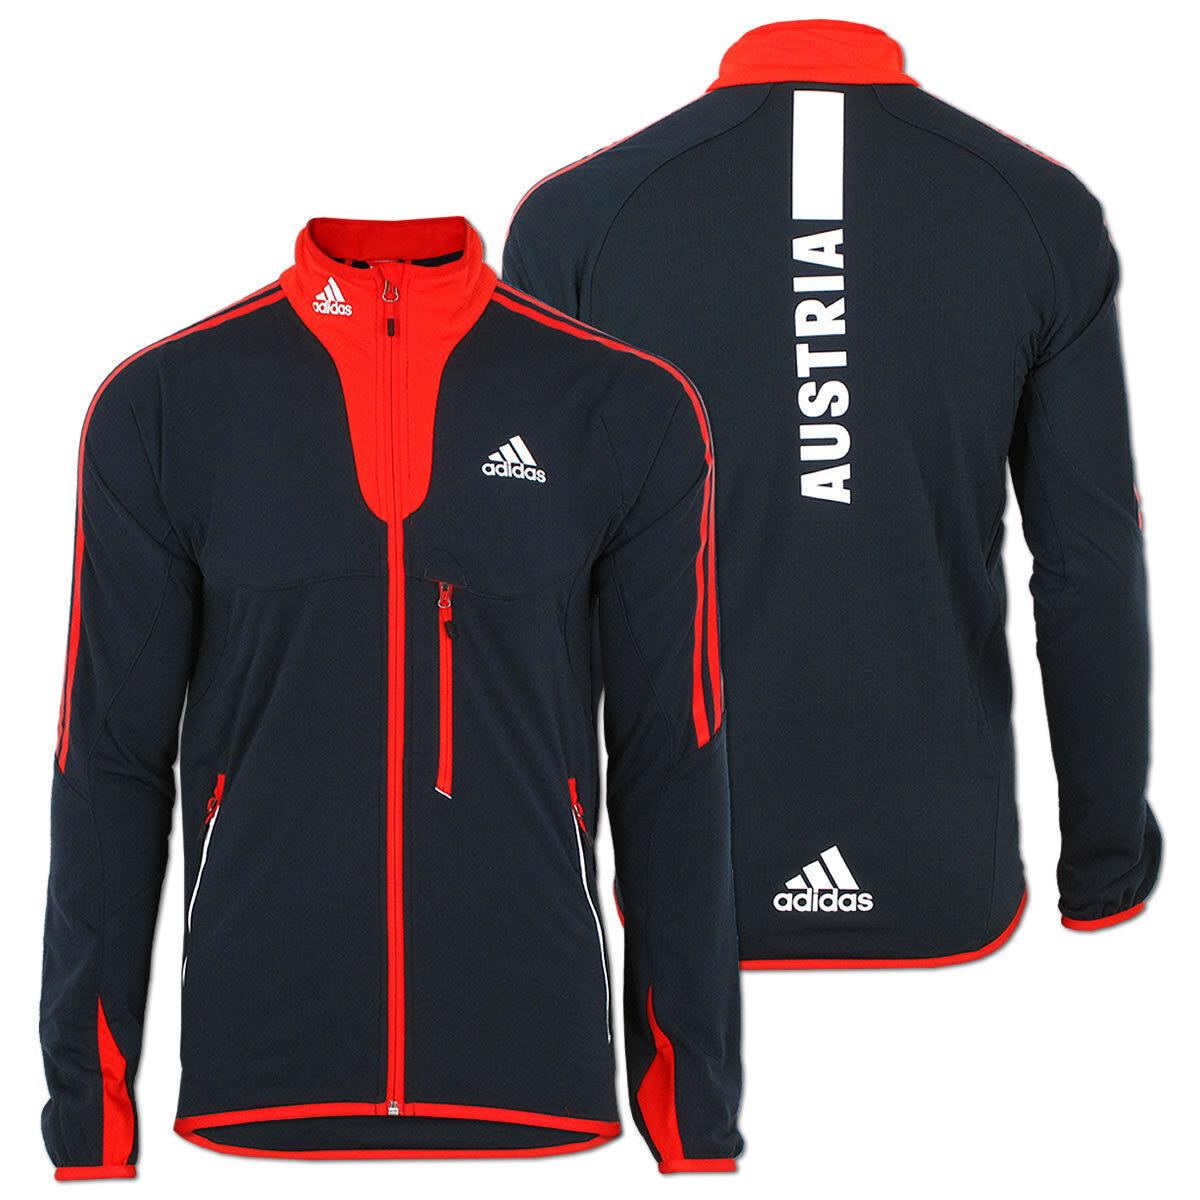 Adidas Herren Fleece Jacke Team Austria Olympia Fleecejacke Österreich ÖSV NEU